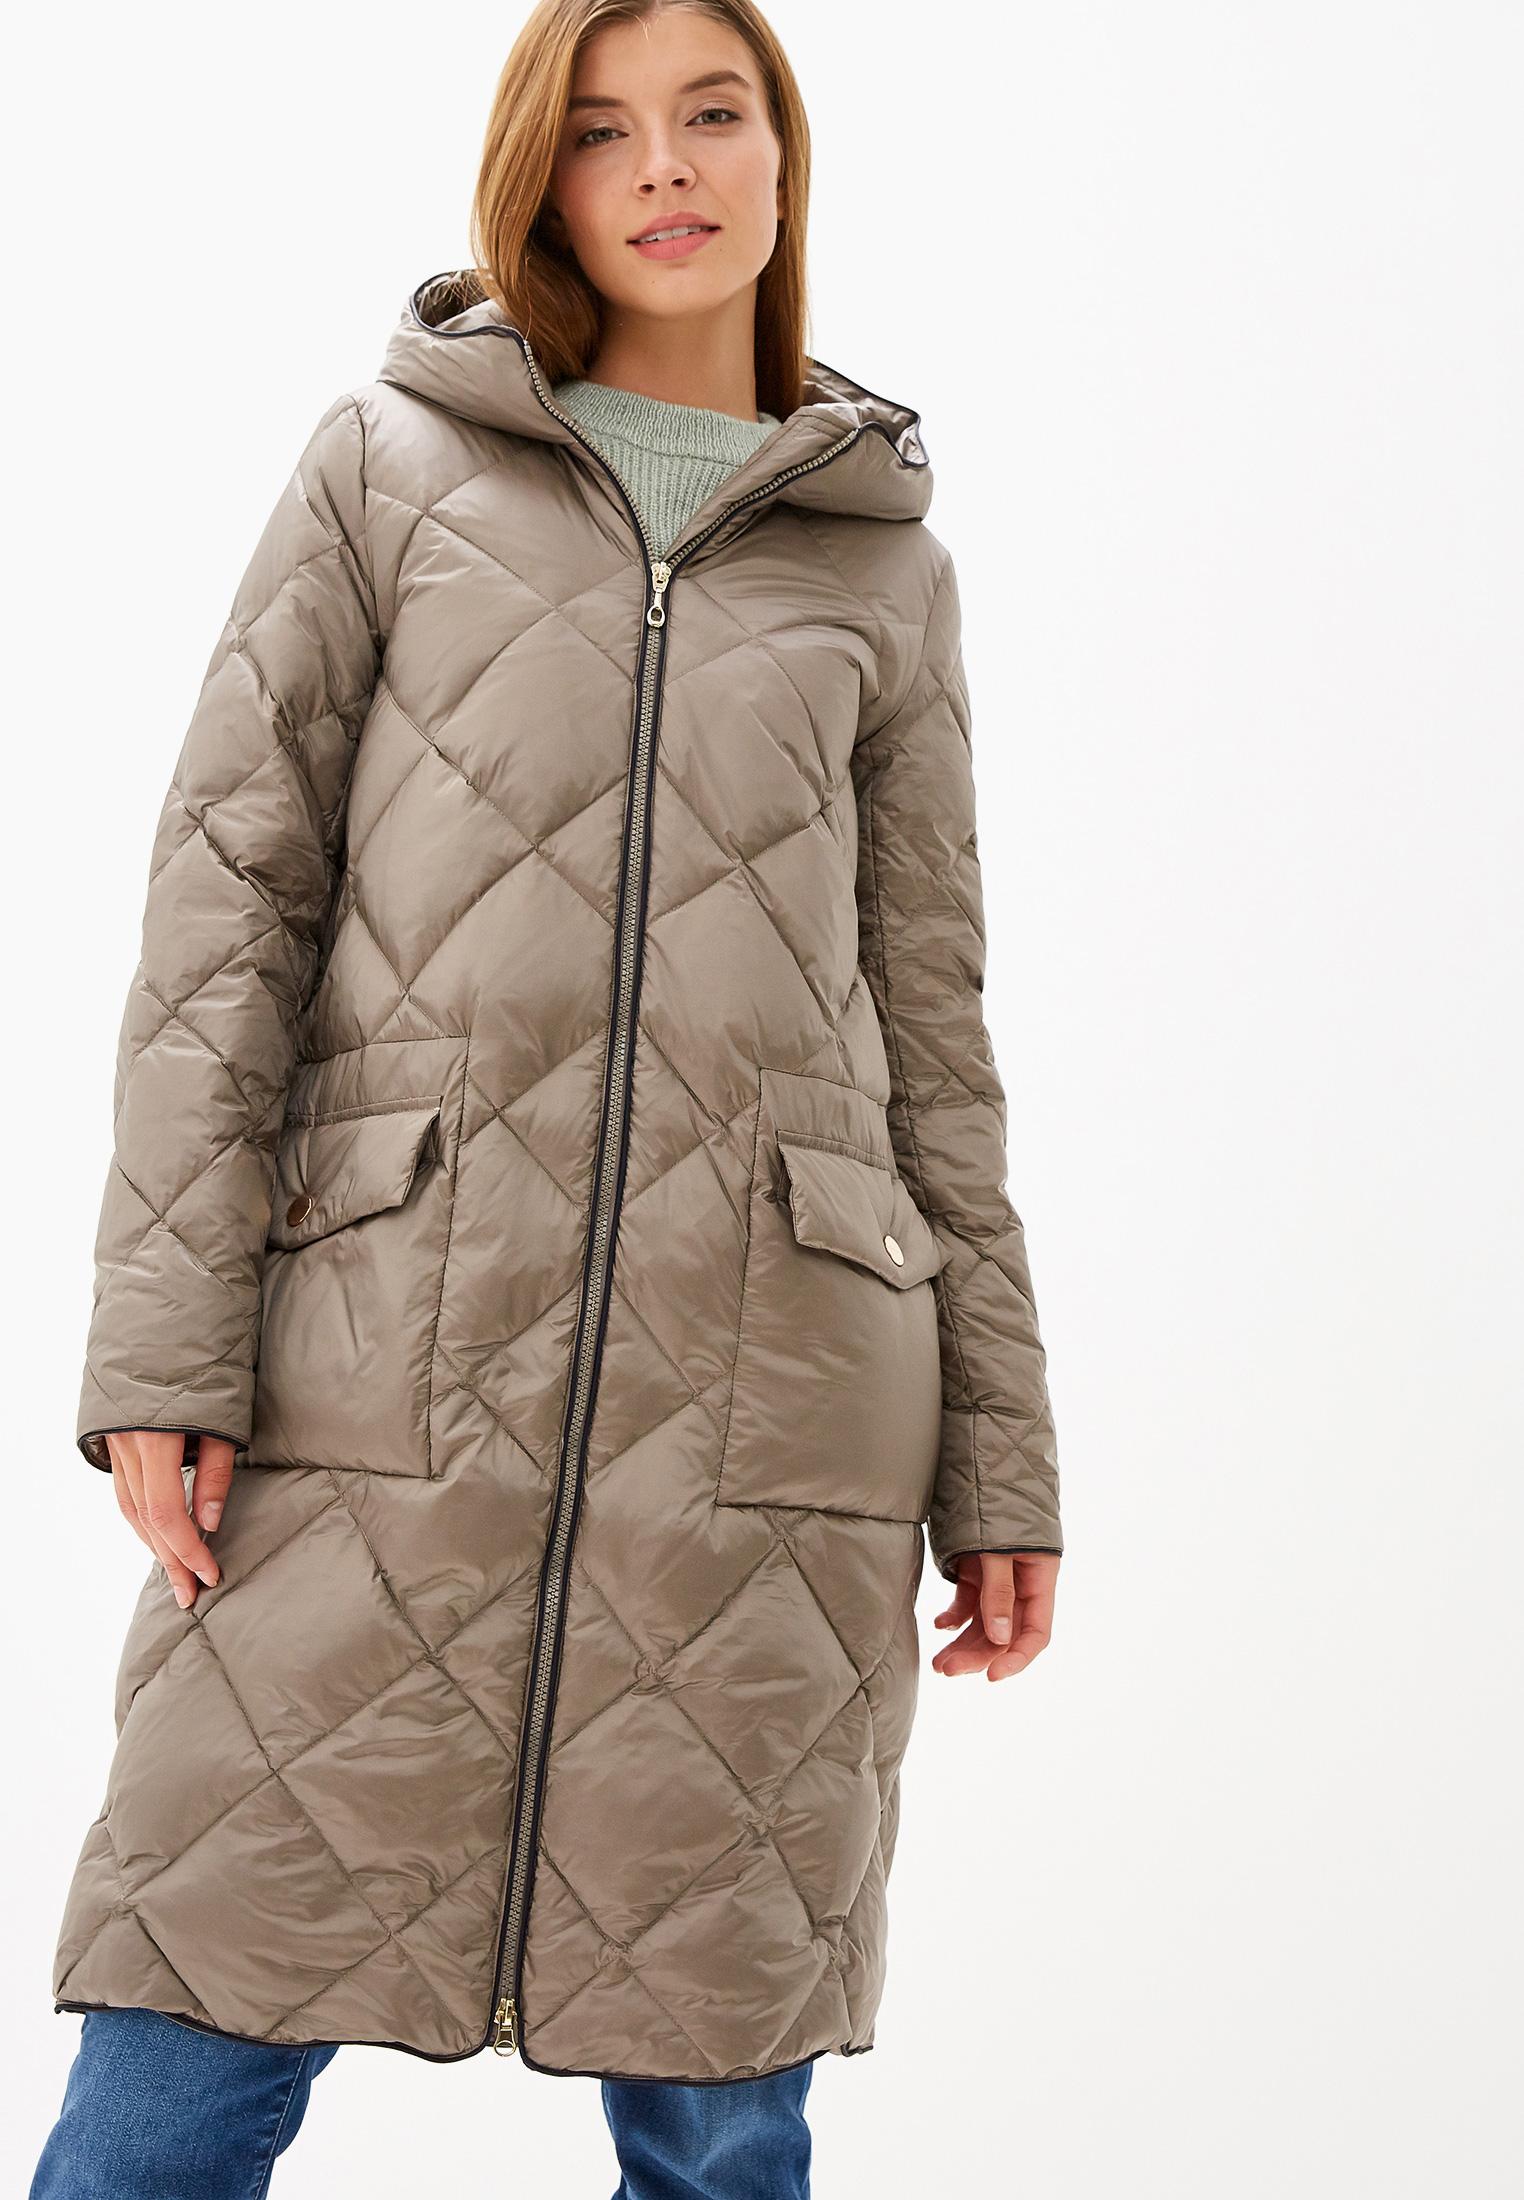 Пуховик, Savage, цвет: коричневый. Артикул: SA004EWGNTW2. Одежда / Верхняя одежда / Пуховики и зимние куртки